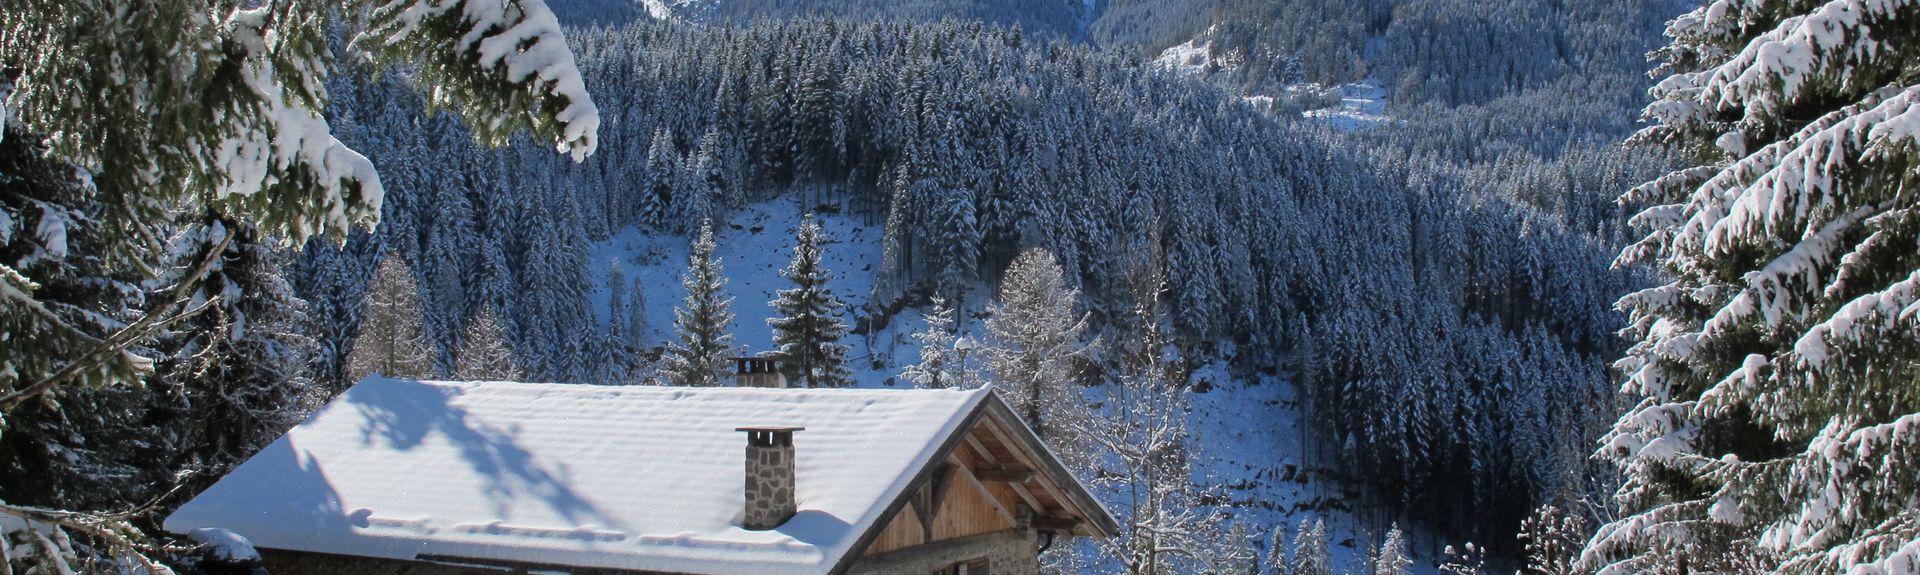 Varena, Trento, Trentino-Alto Adige/South Tyrol, Italy